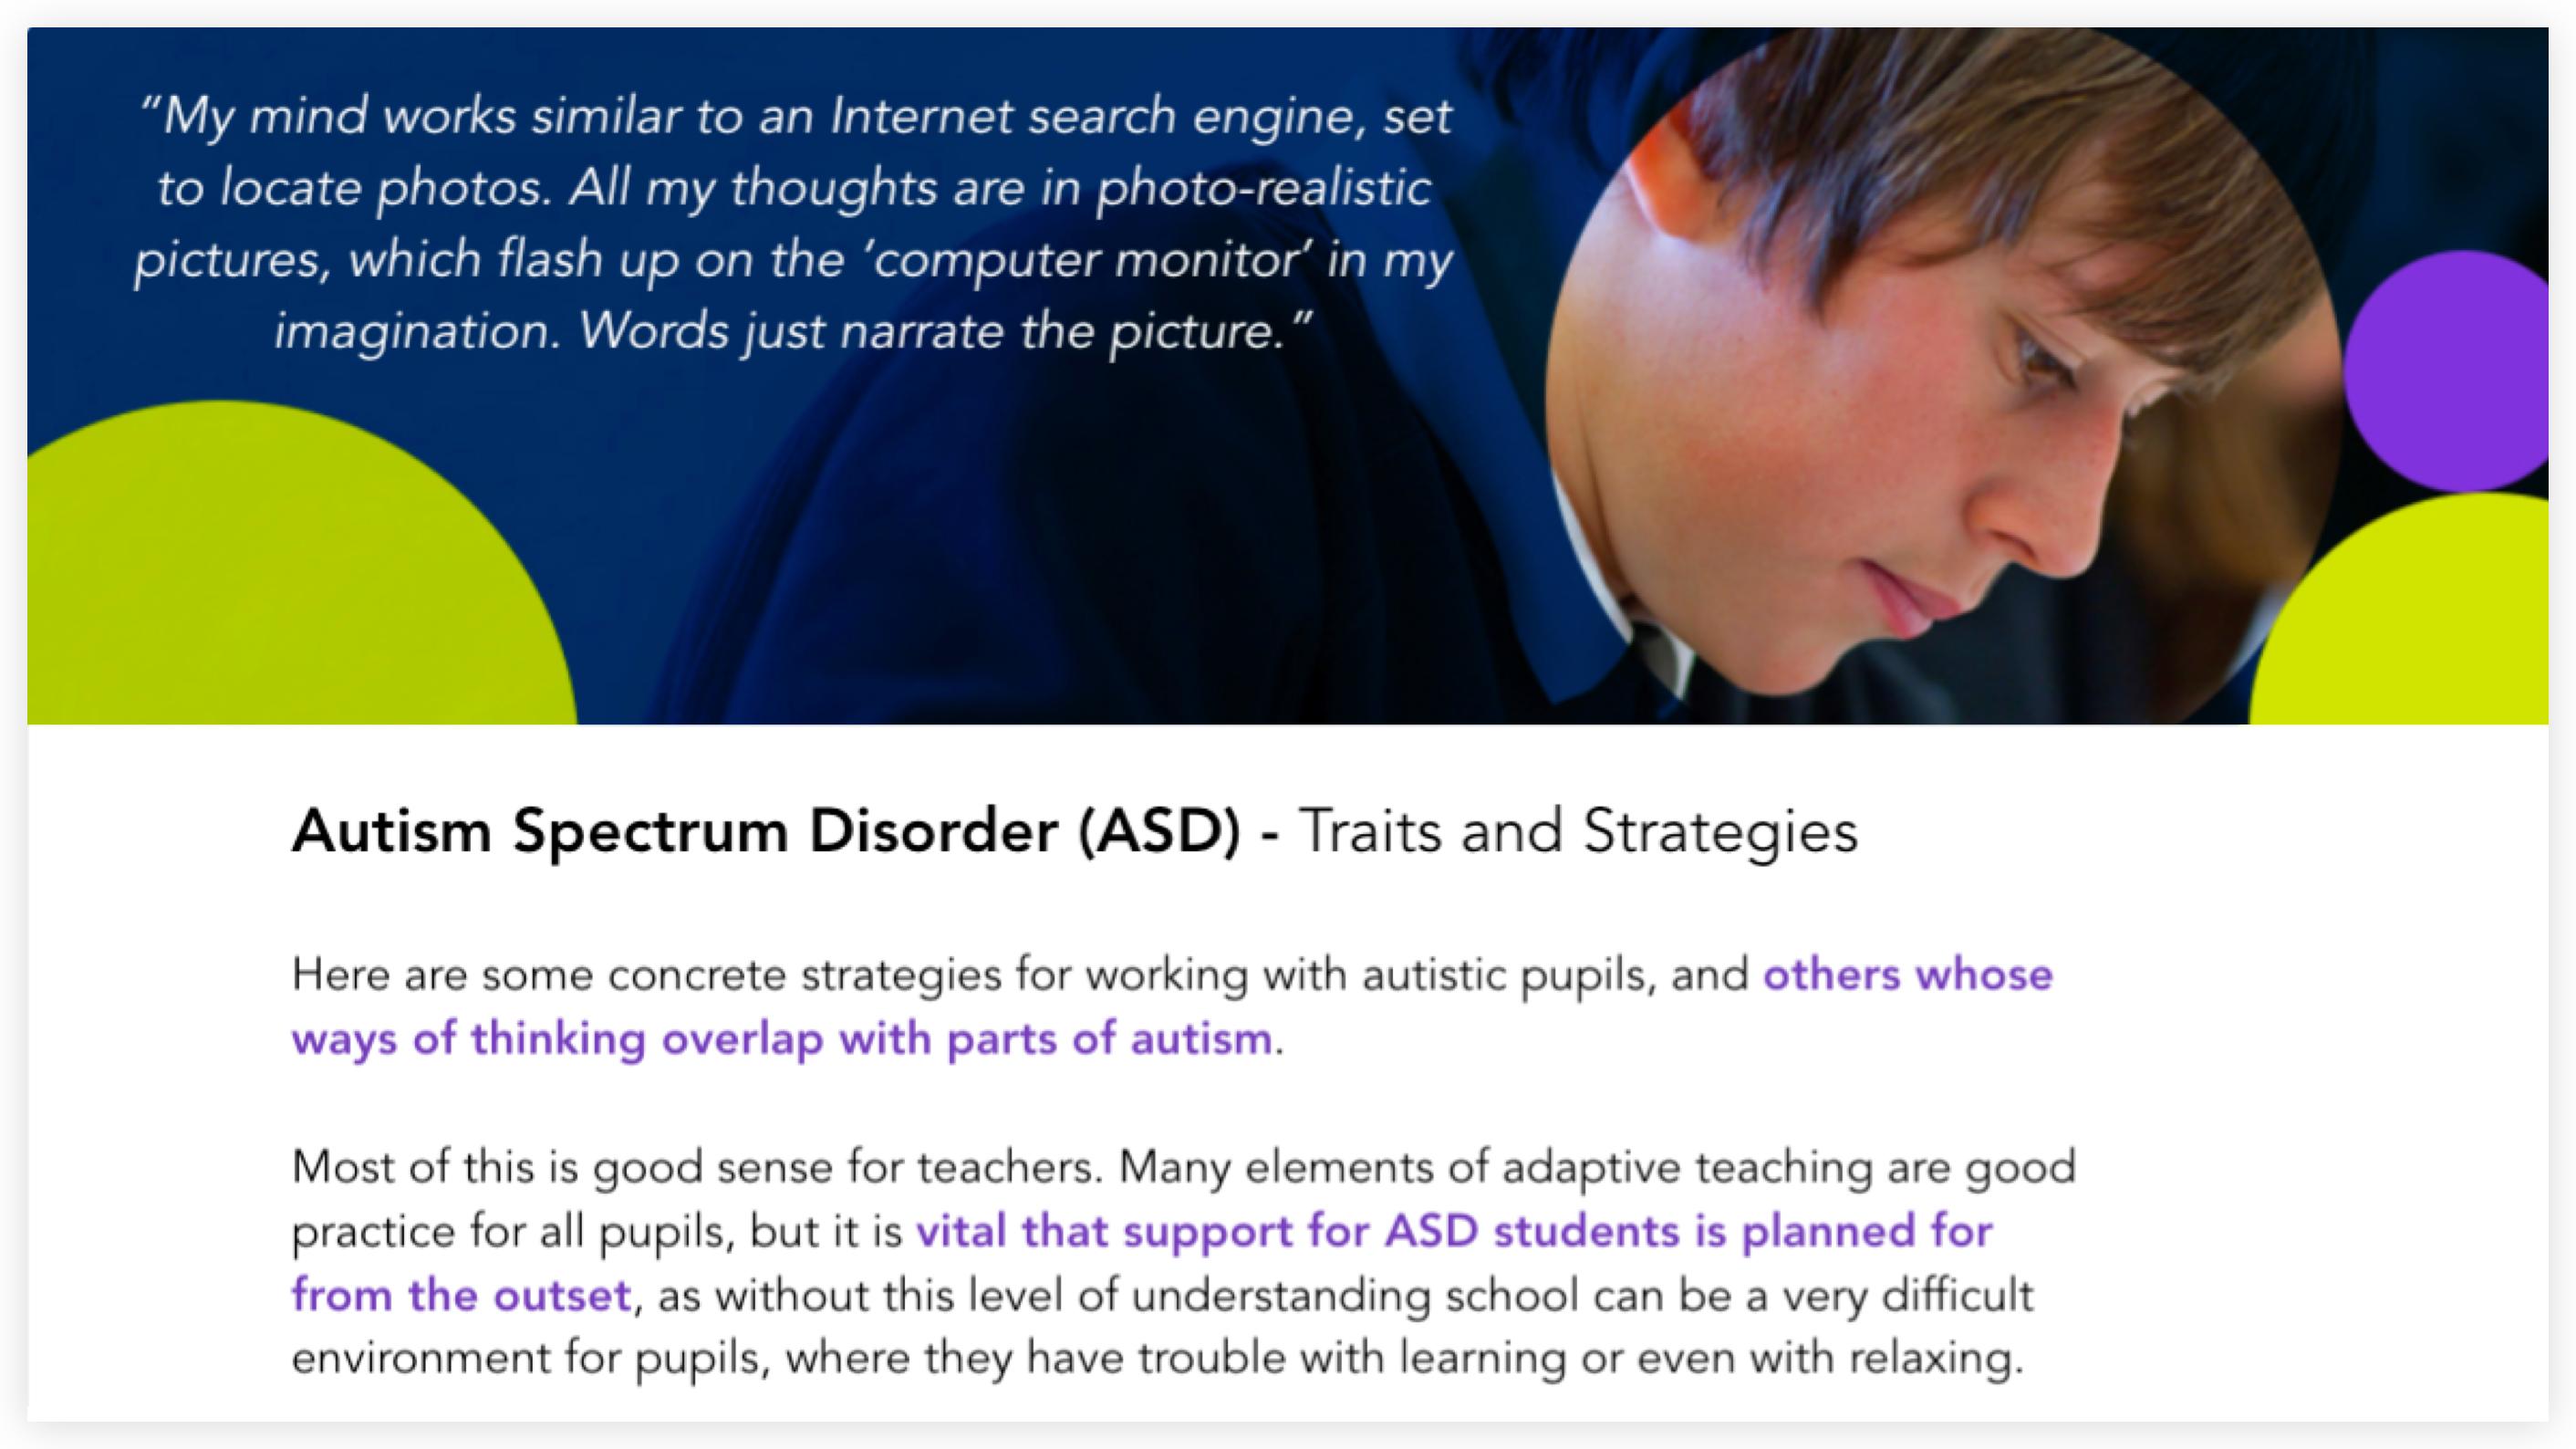 Autism Spectrum Disorder (ASD) image